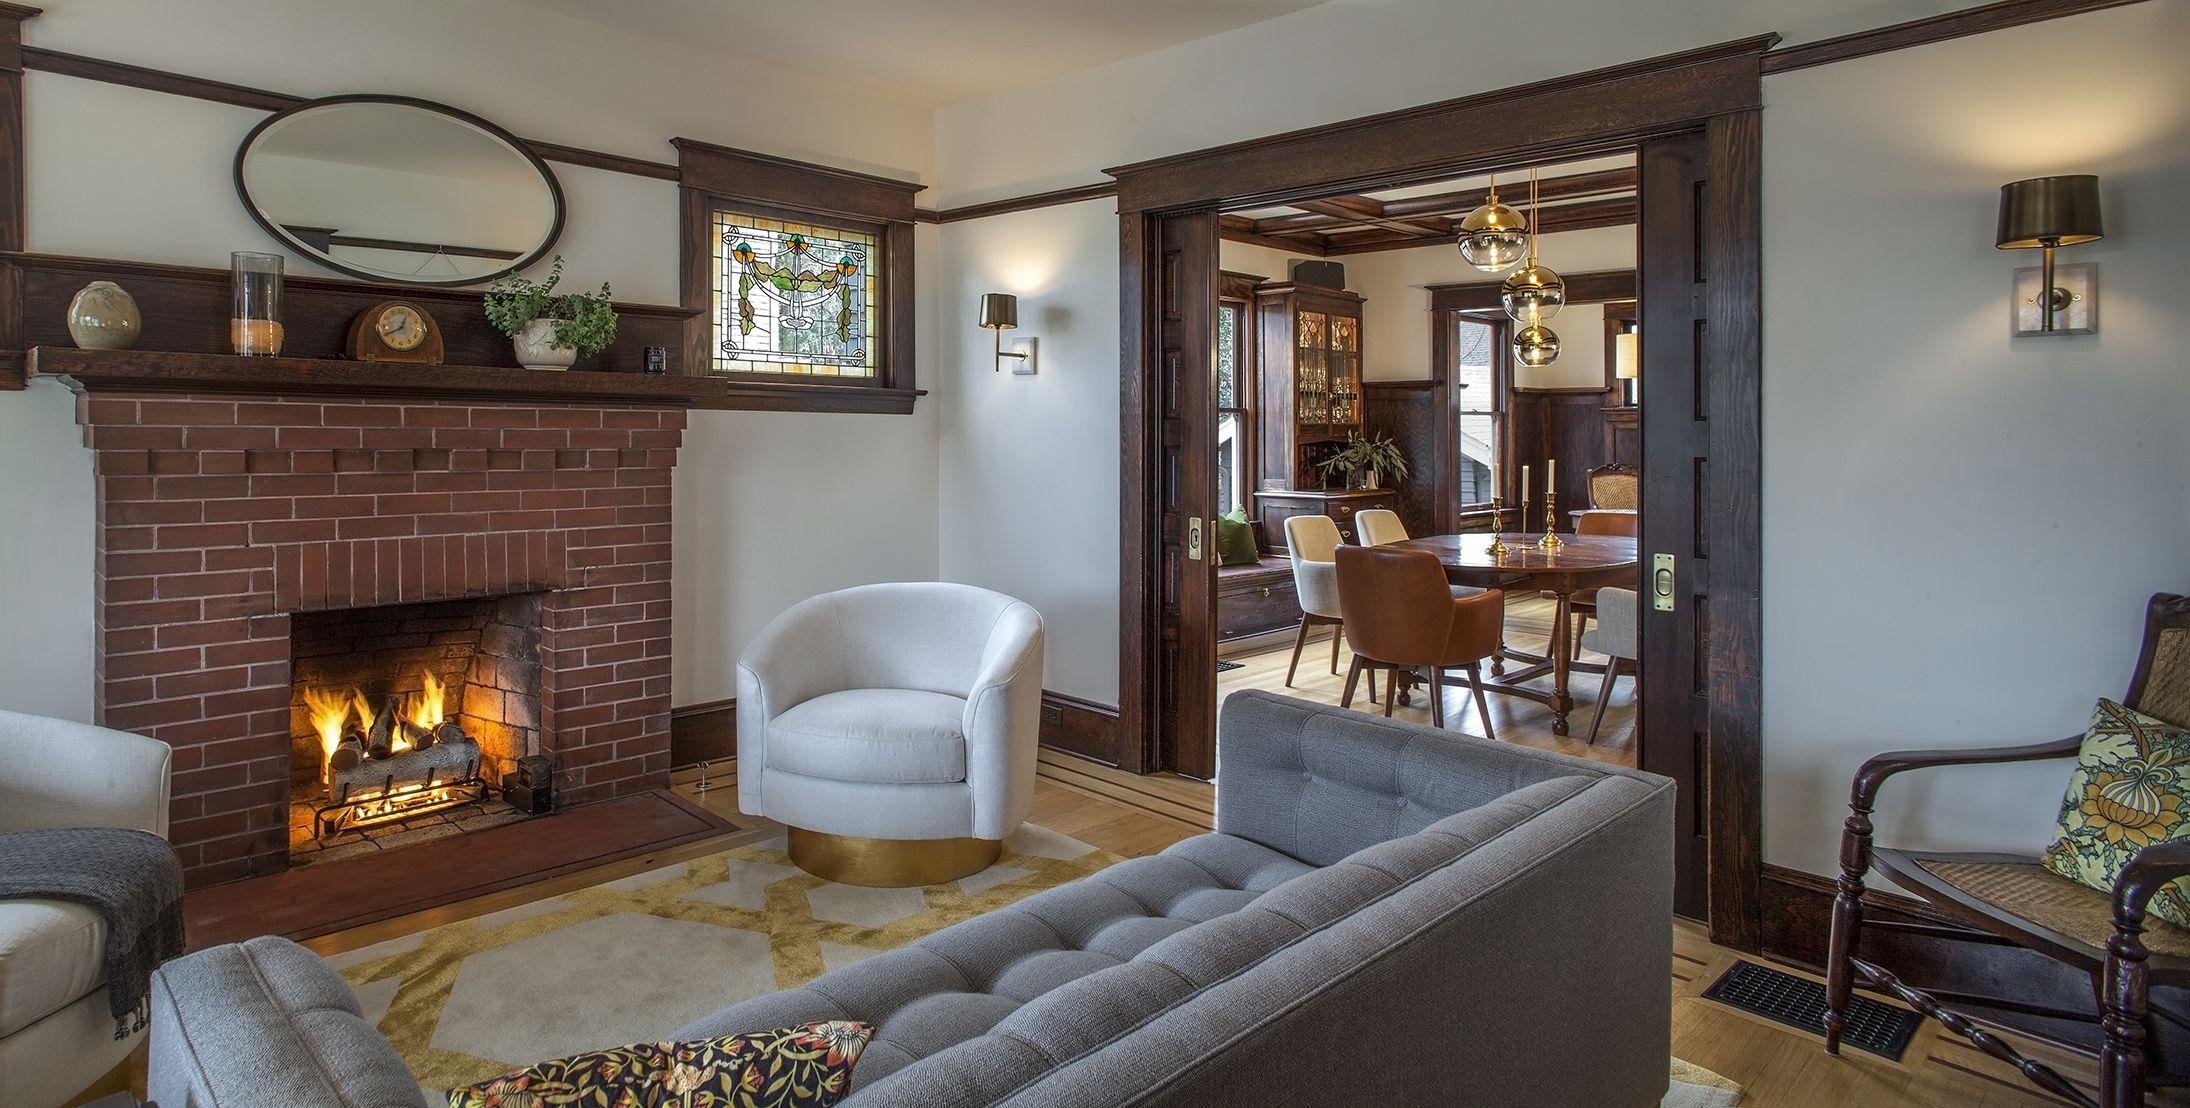 More Information Saved From Craftsman Design & Renovation